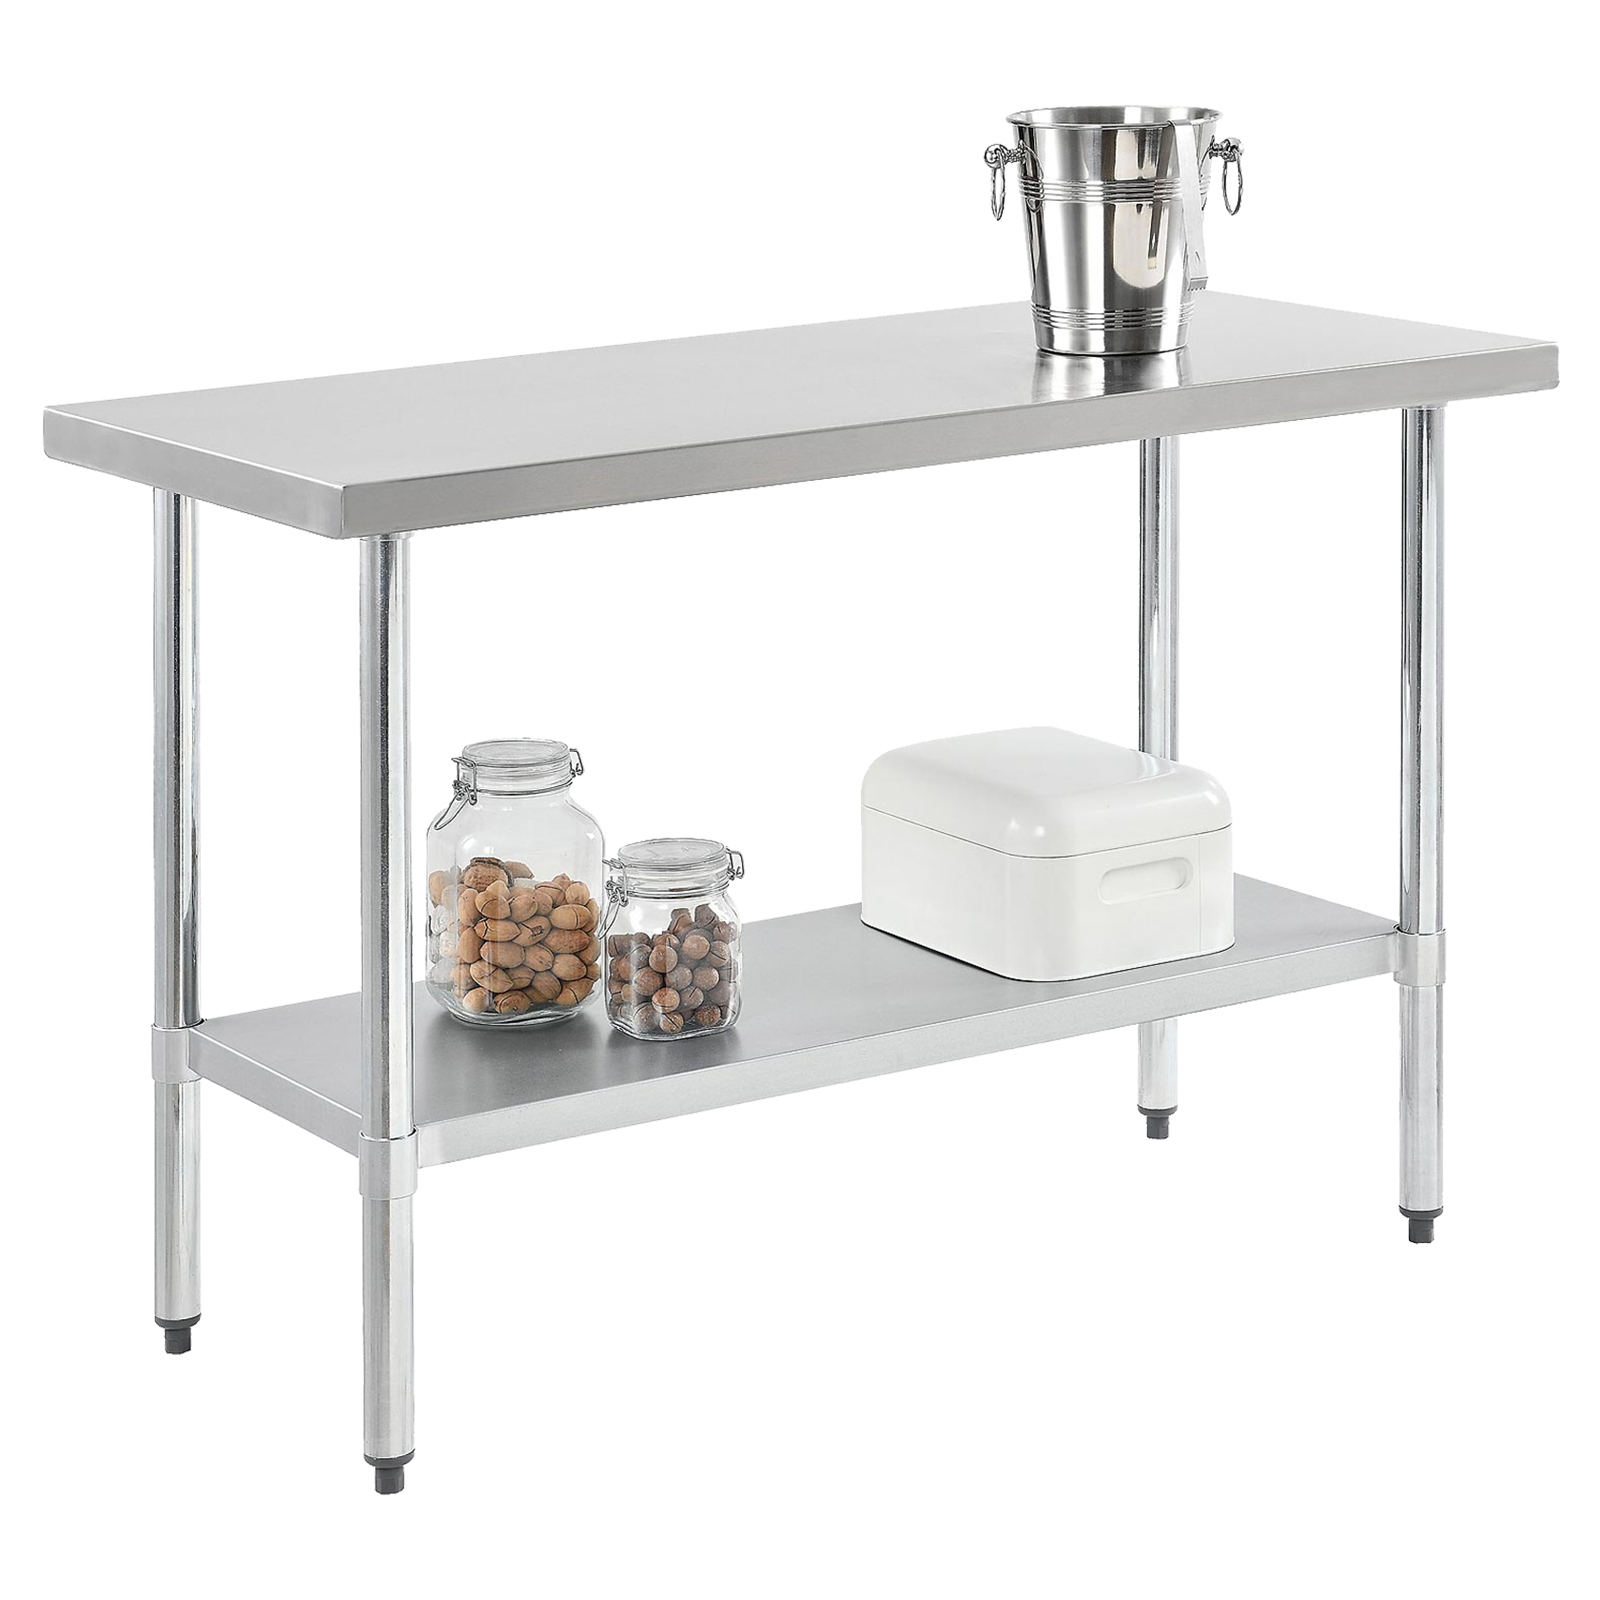 NEXEL WB6030SS work table,  54